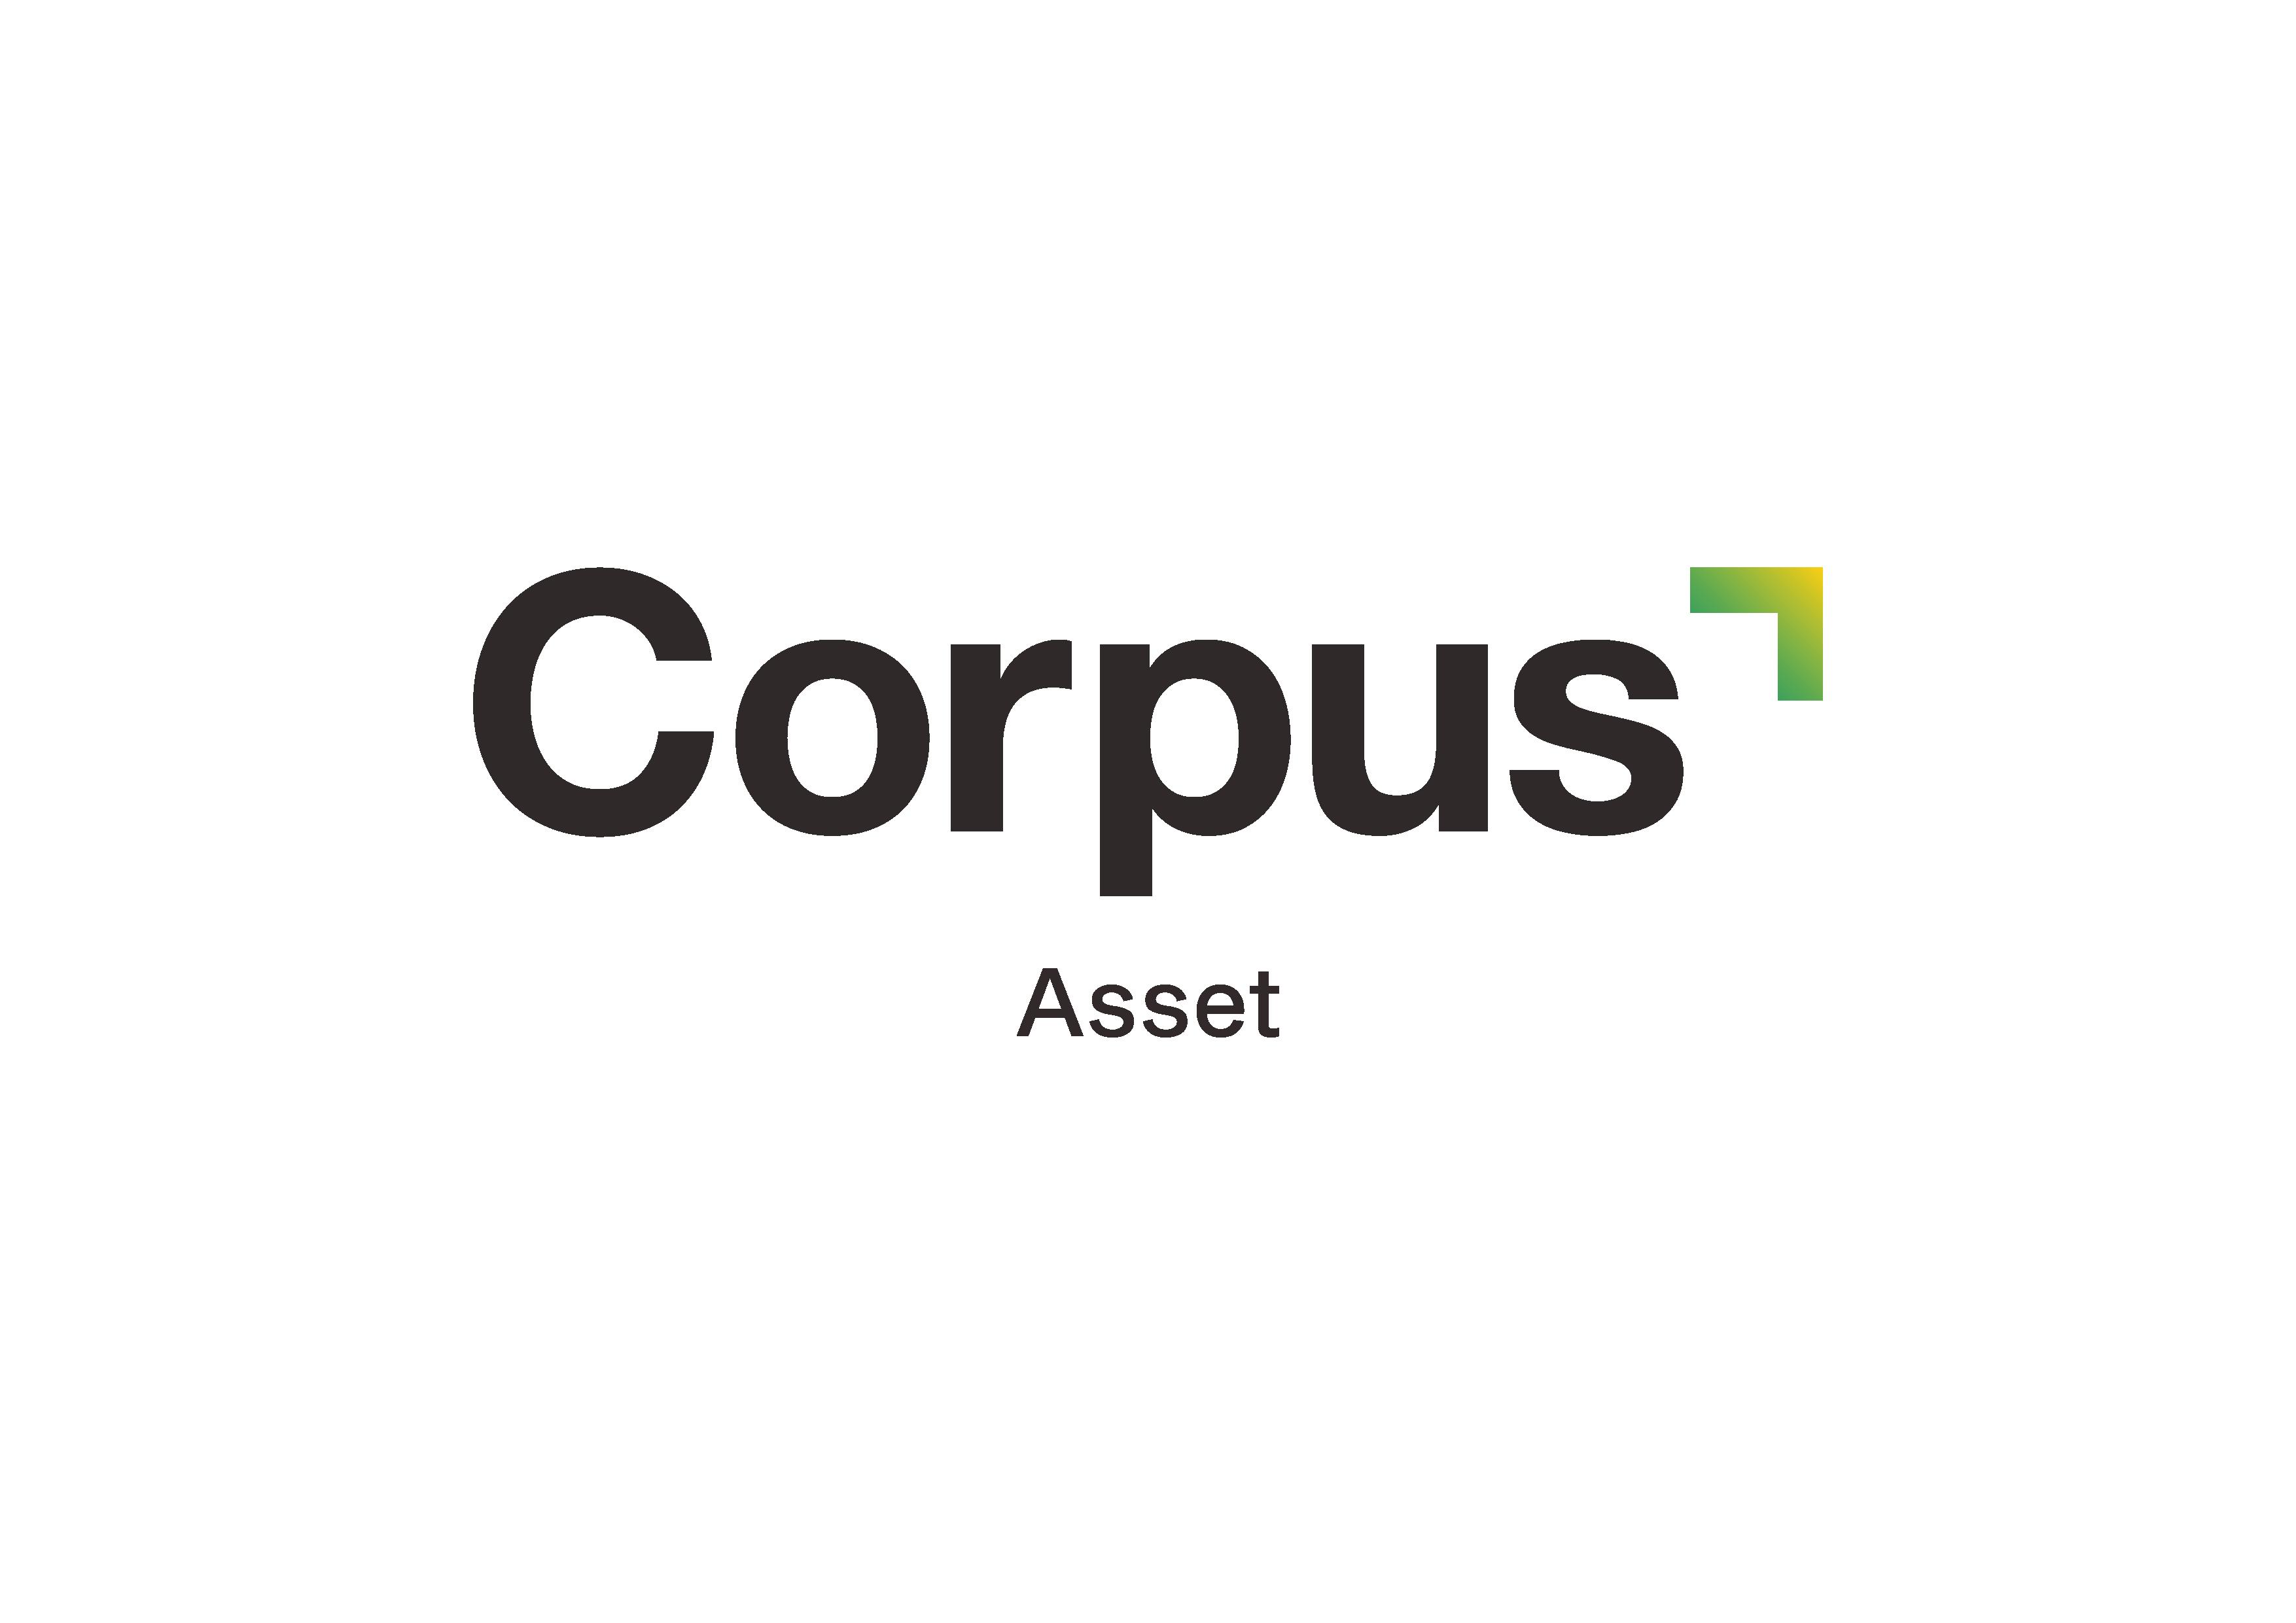 Corpus Kapital Manajemen PT